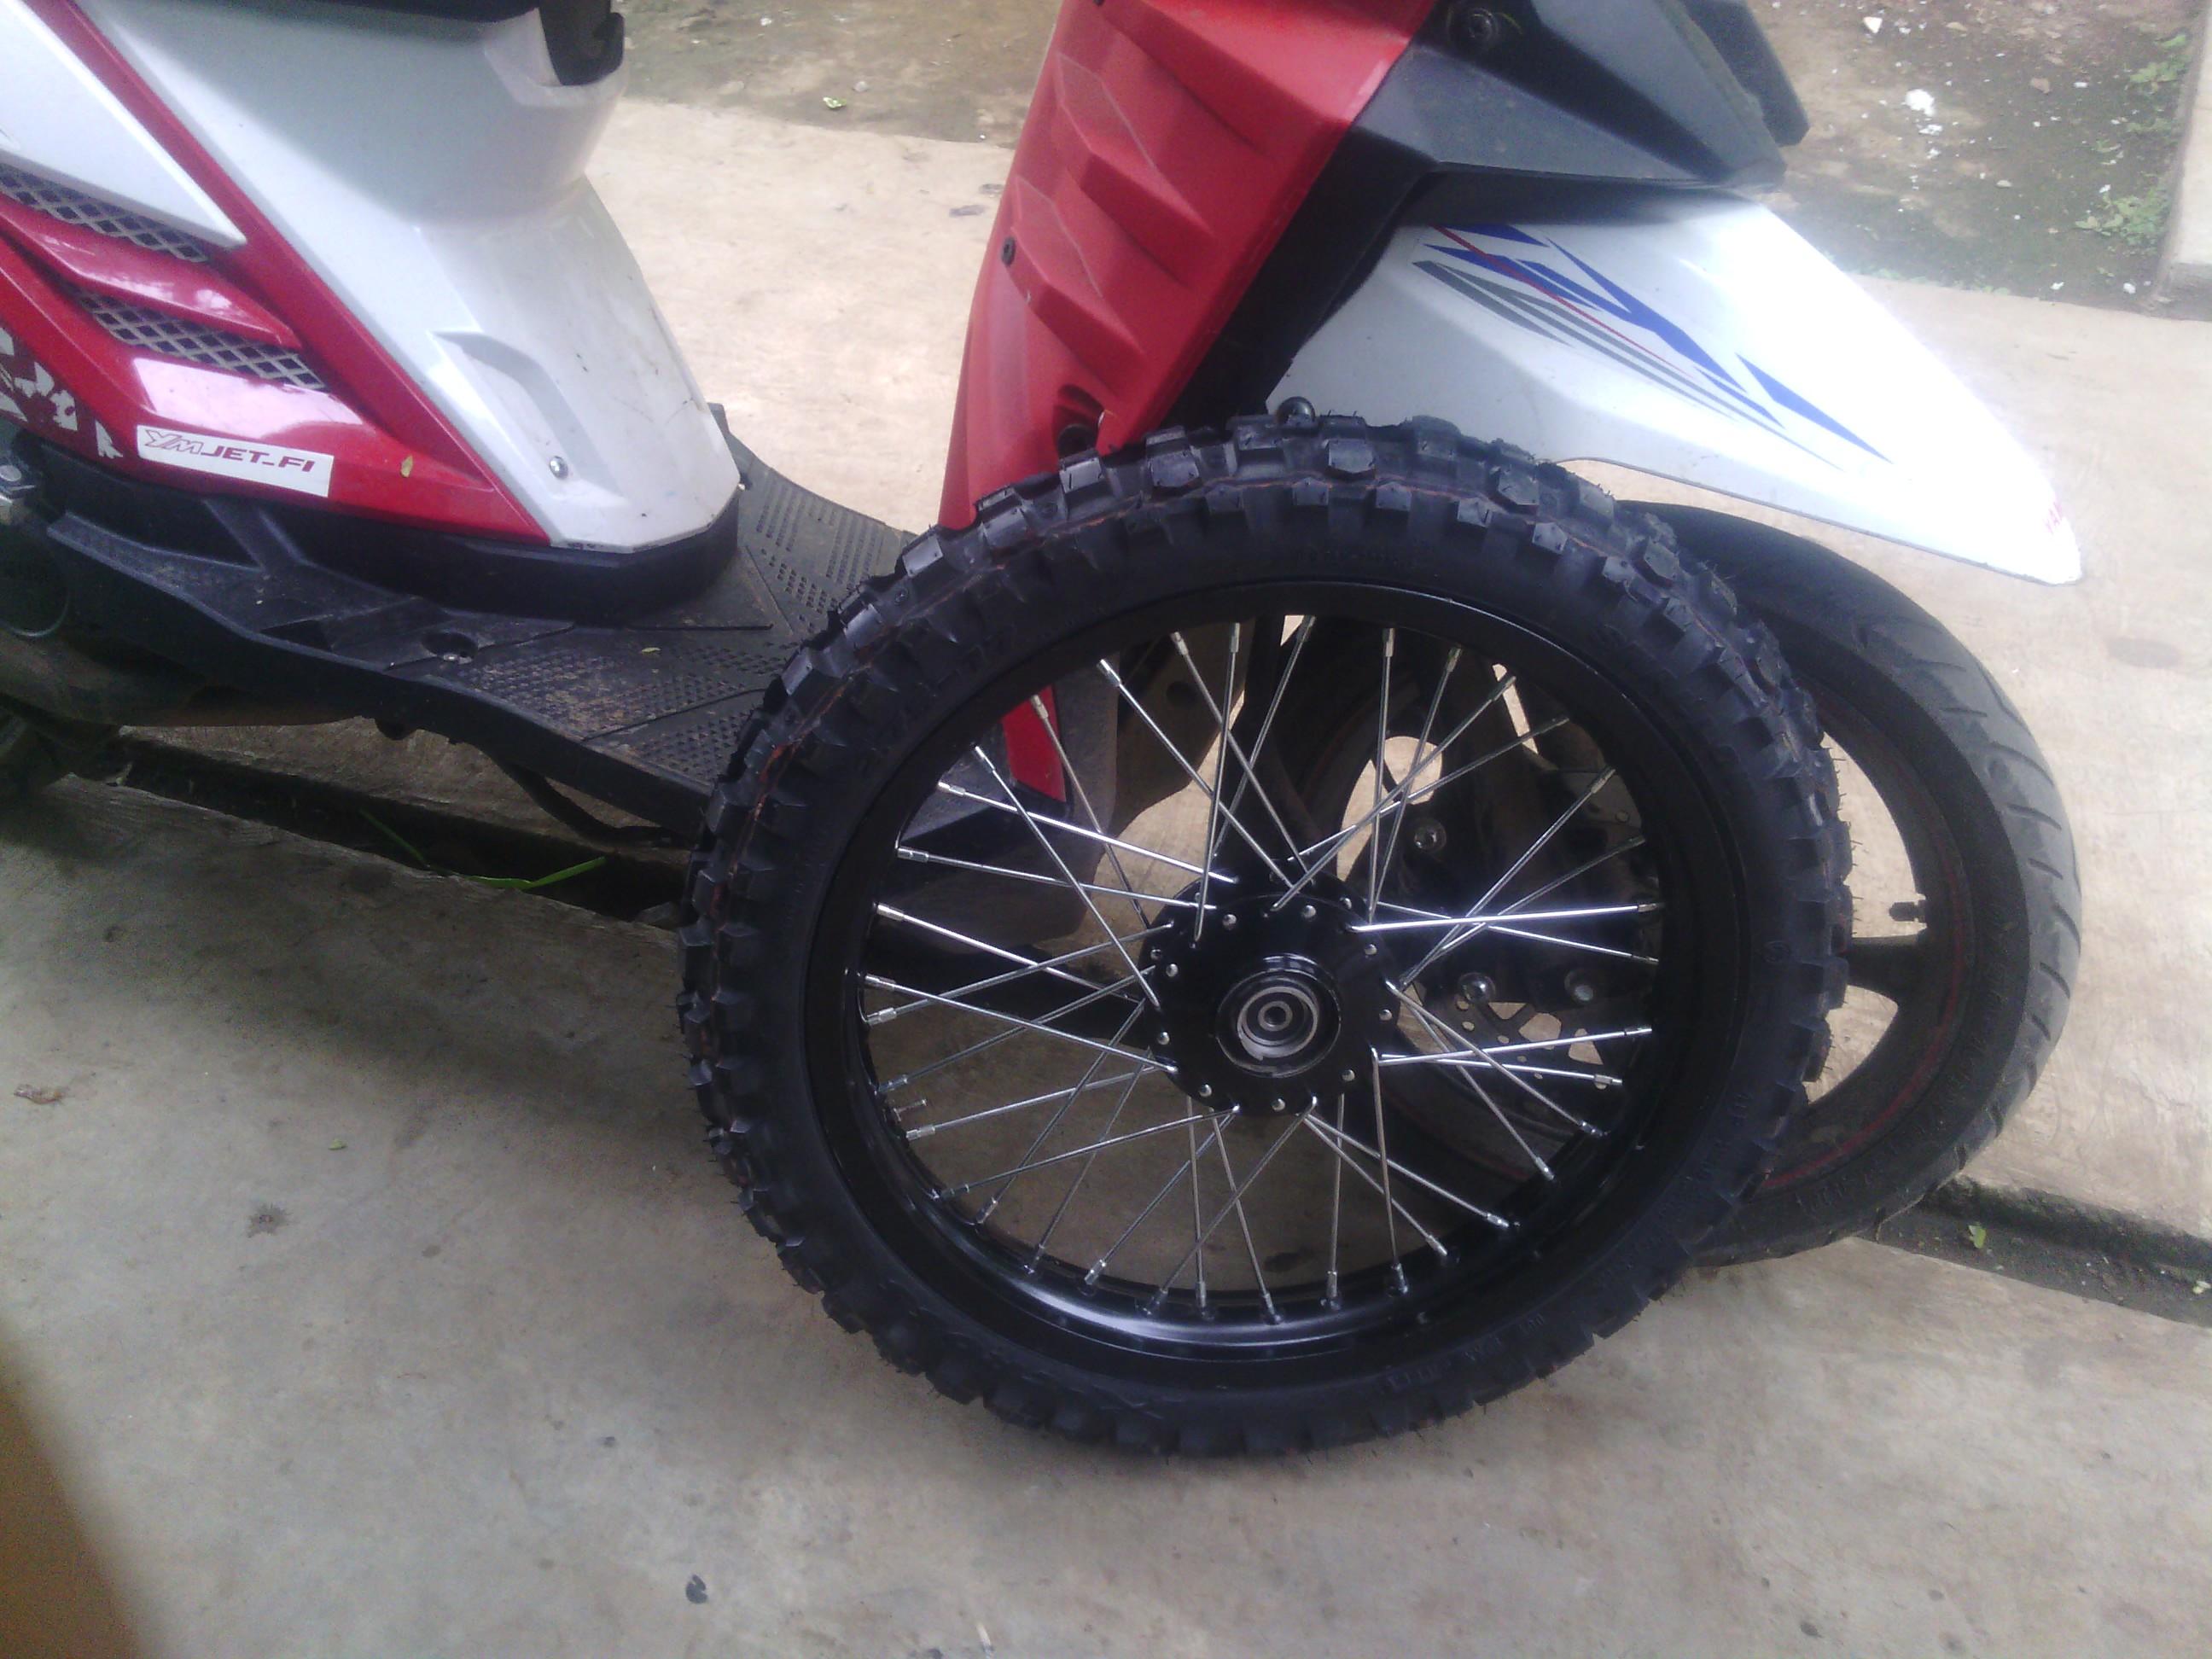 Estimasi Merubah Kaki Kaki Yamaha X Ride Menjadi Cross